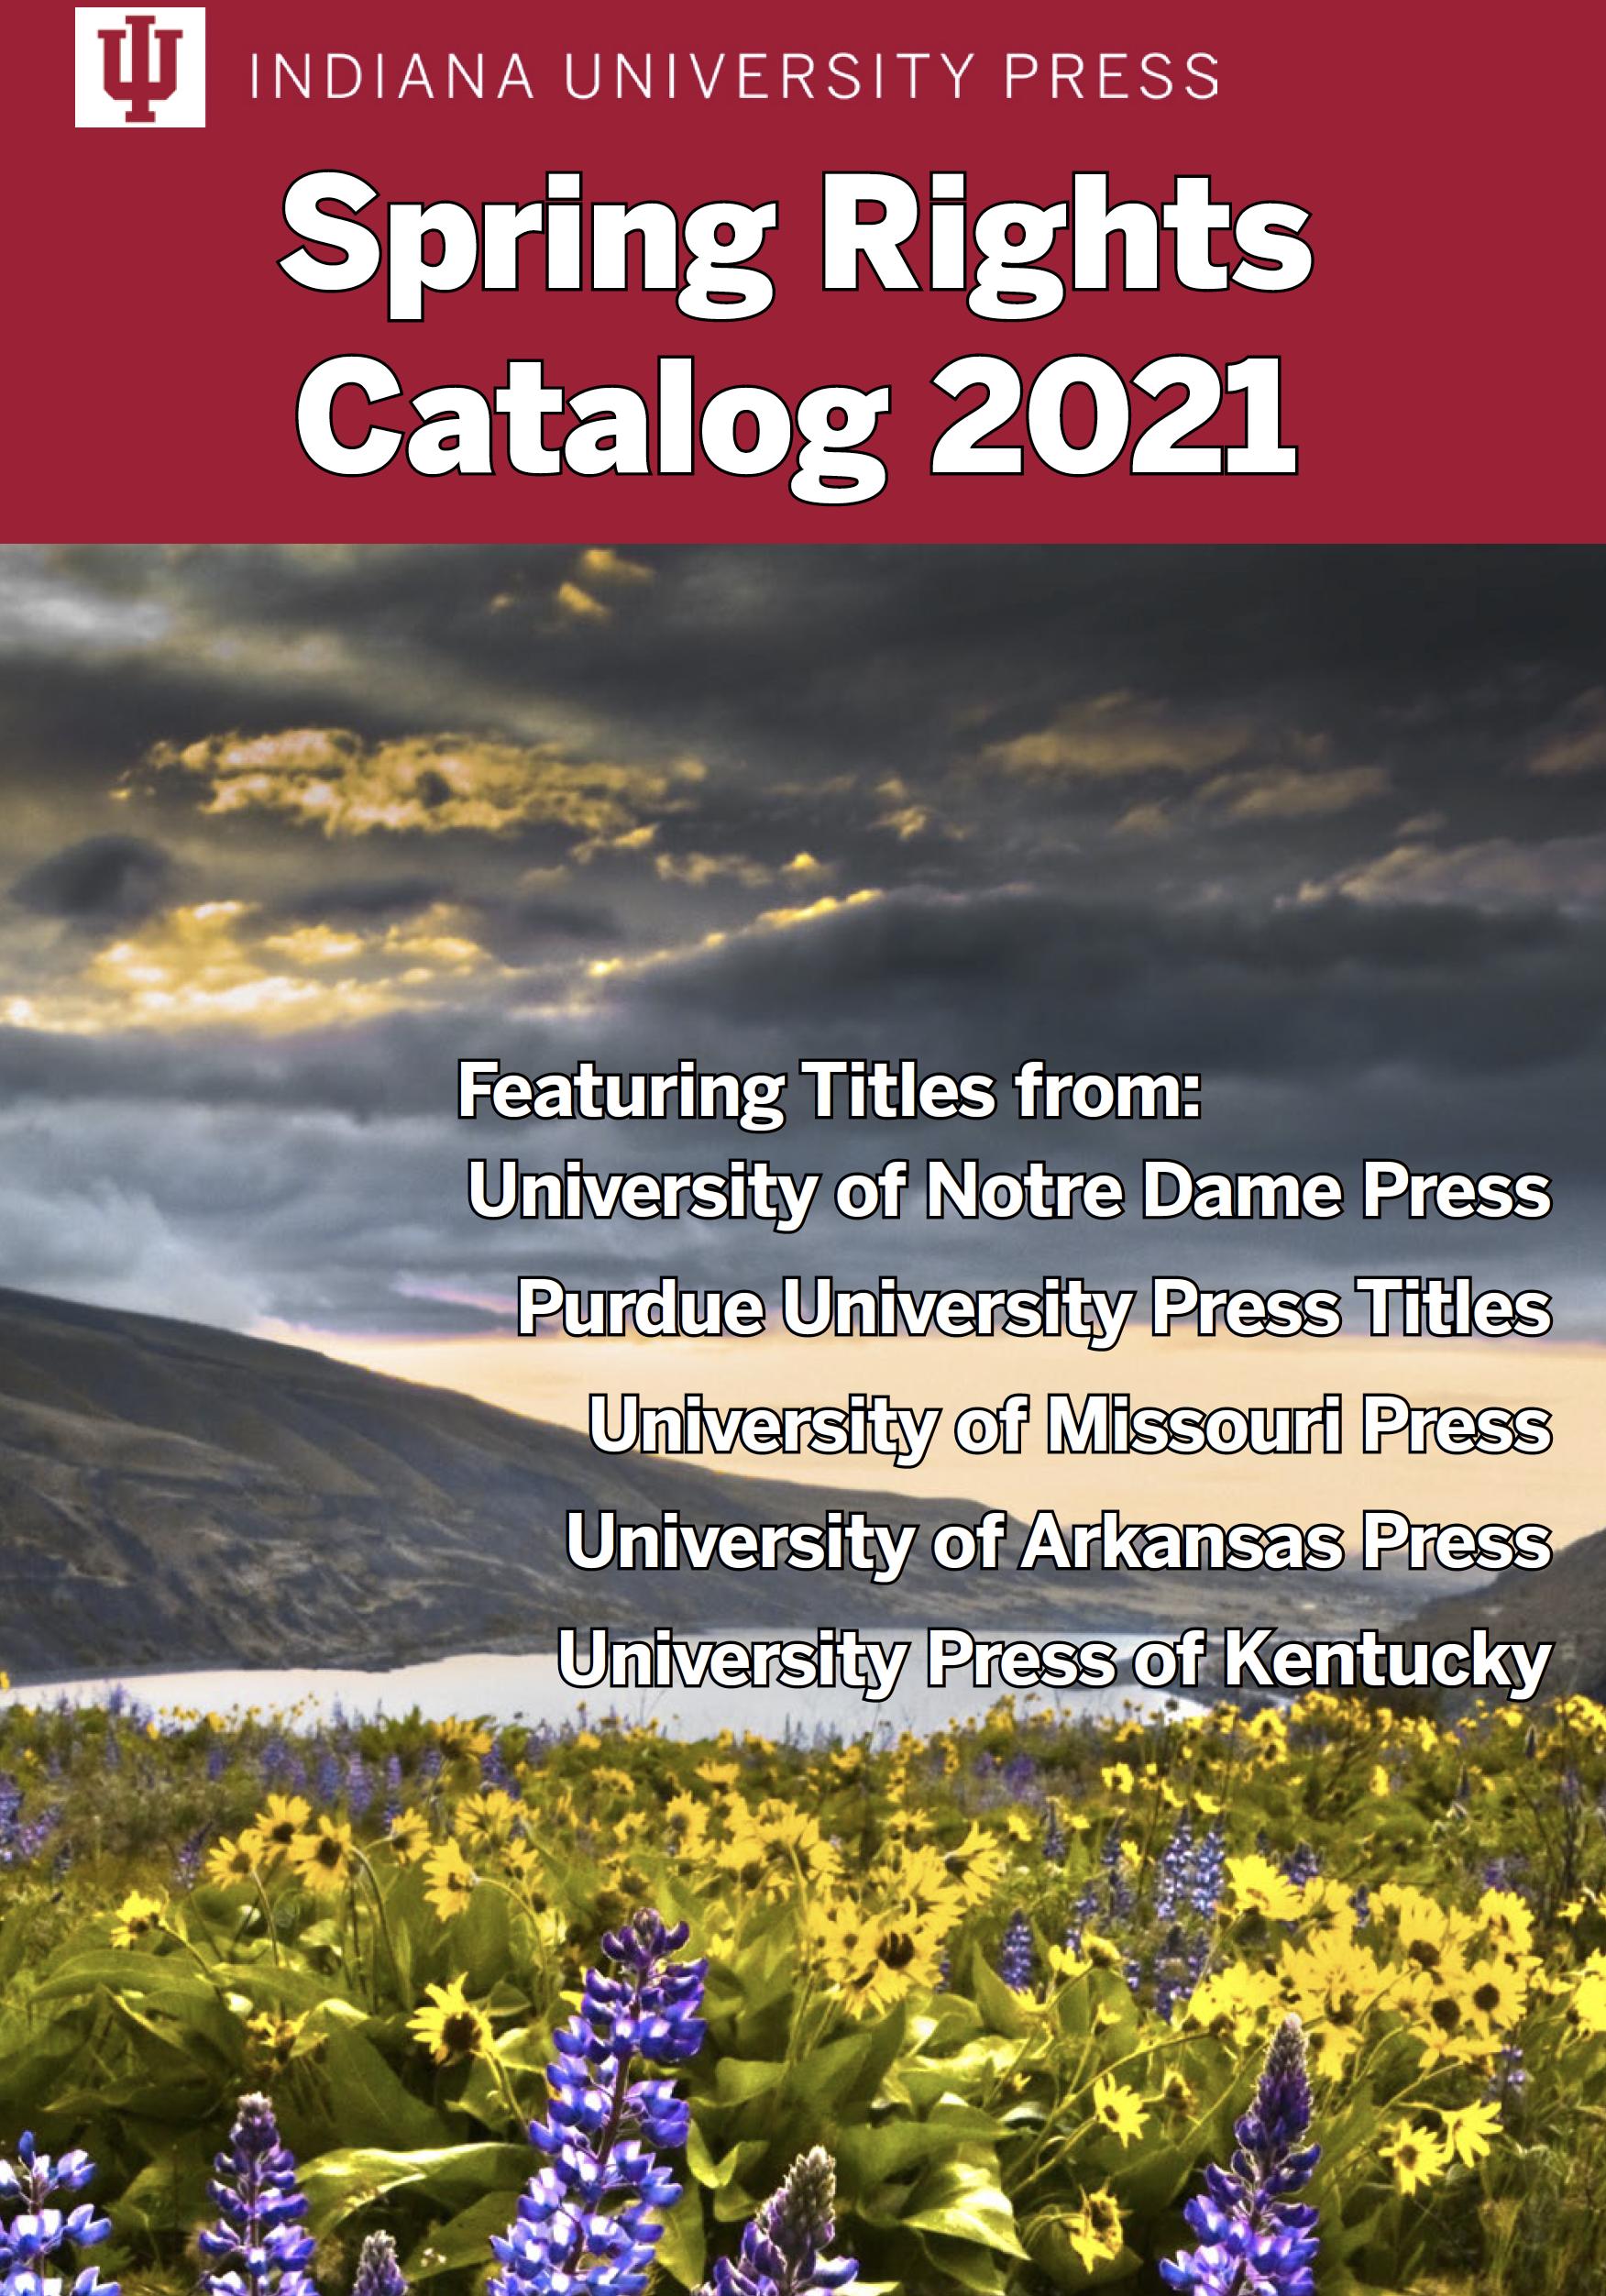 IU Press Rights Catalog - Spring 2021